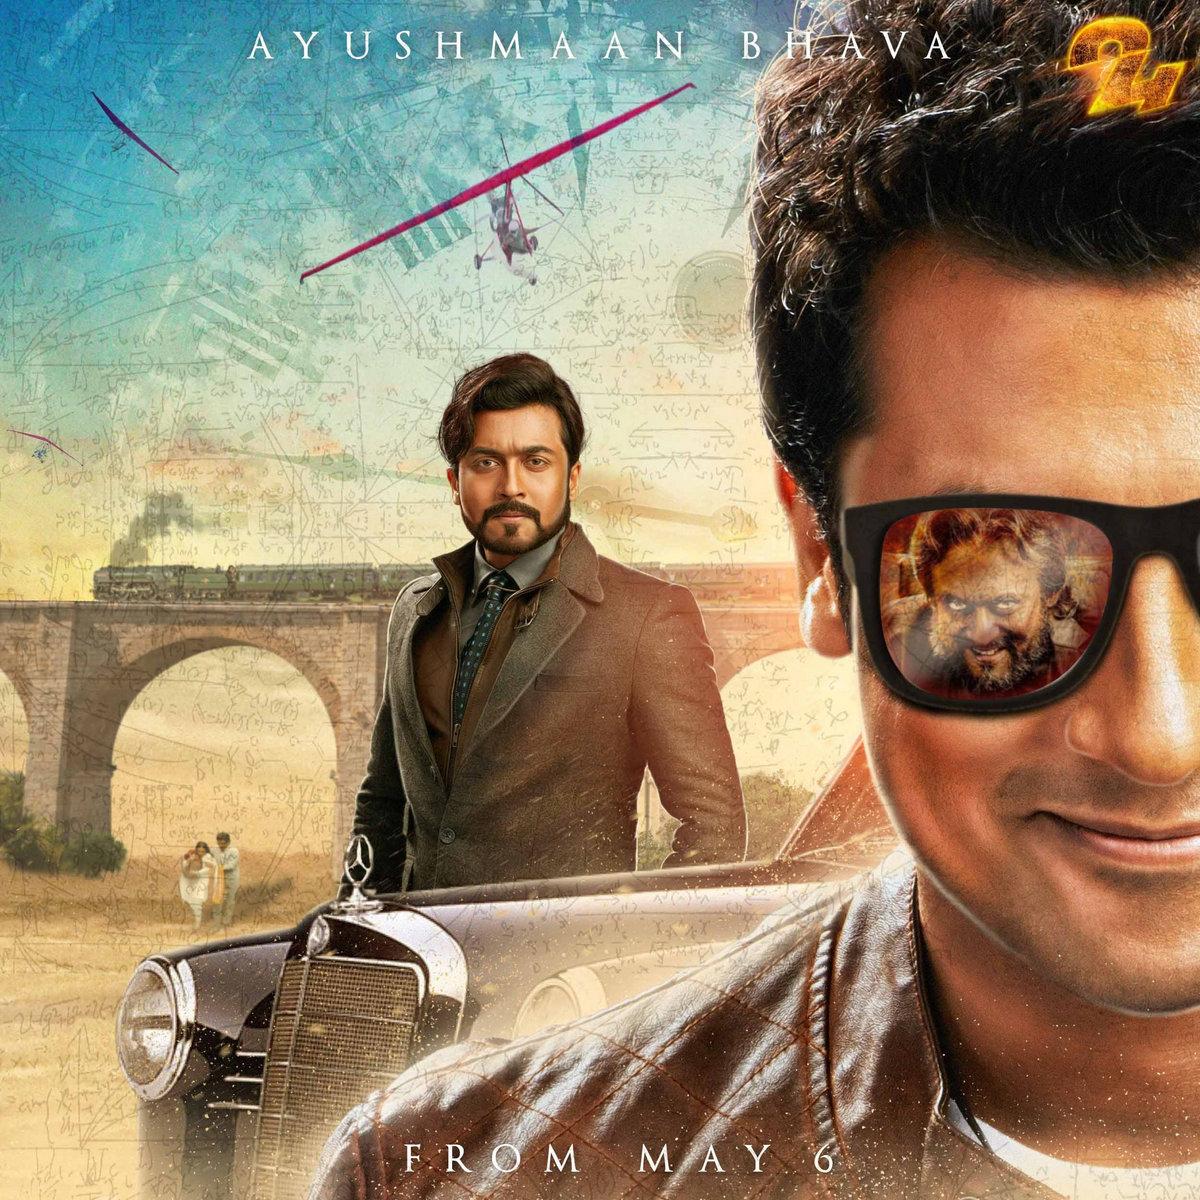 100 days of love malayalam movie mp4 download